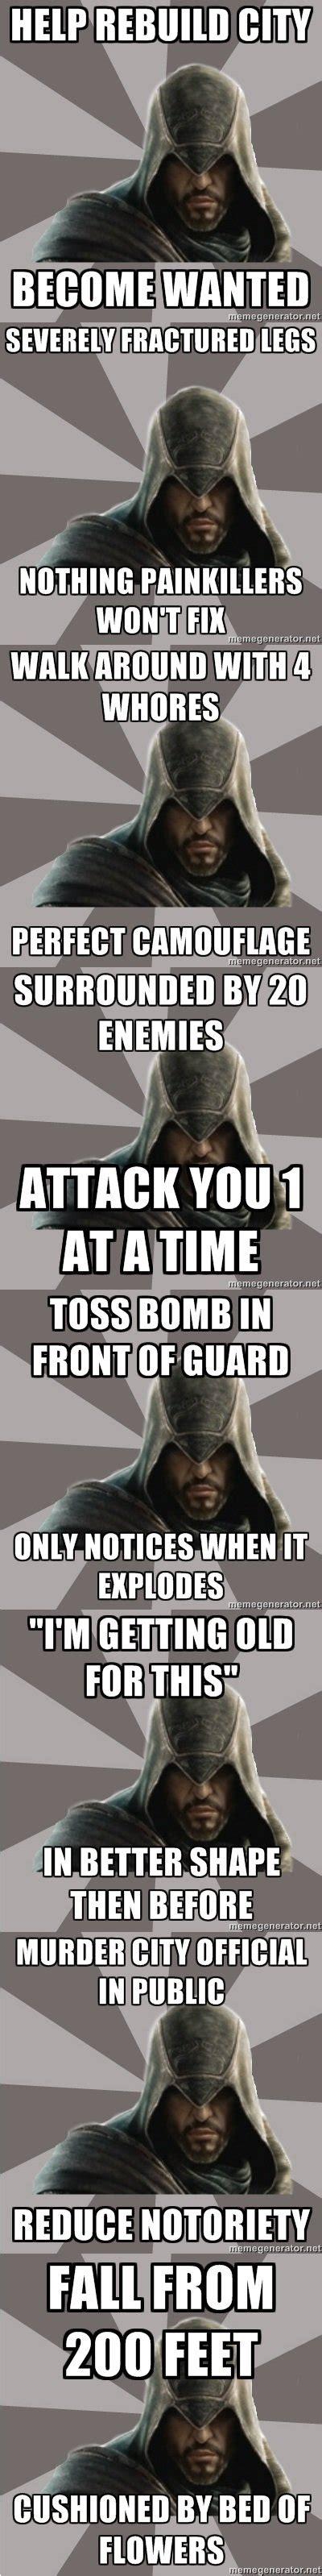 Assassins Creed 4 Memes - assassin s creed memes henchman 4 hire